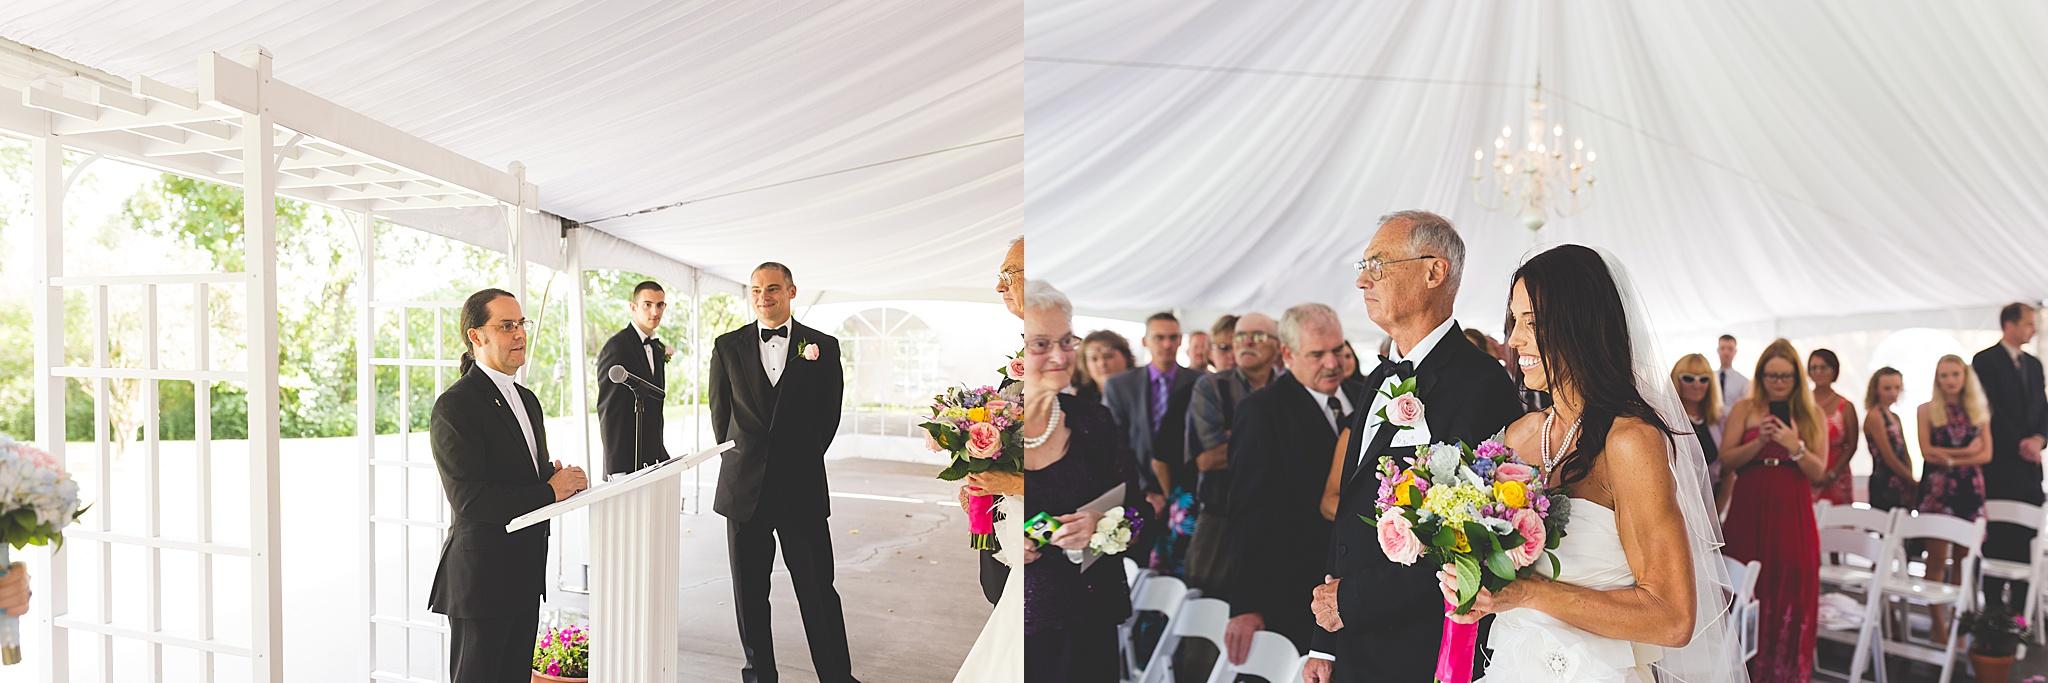 Albany_Wedding_Photographer_7627.jpg